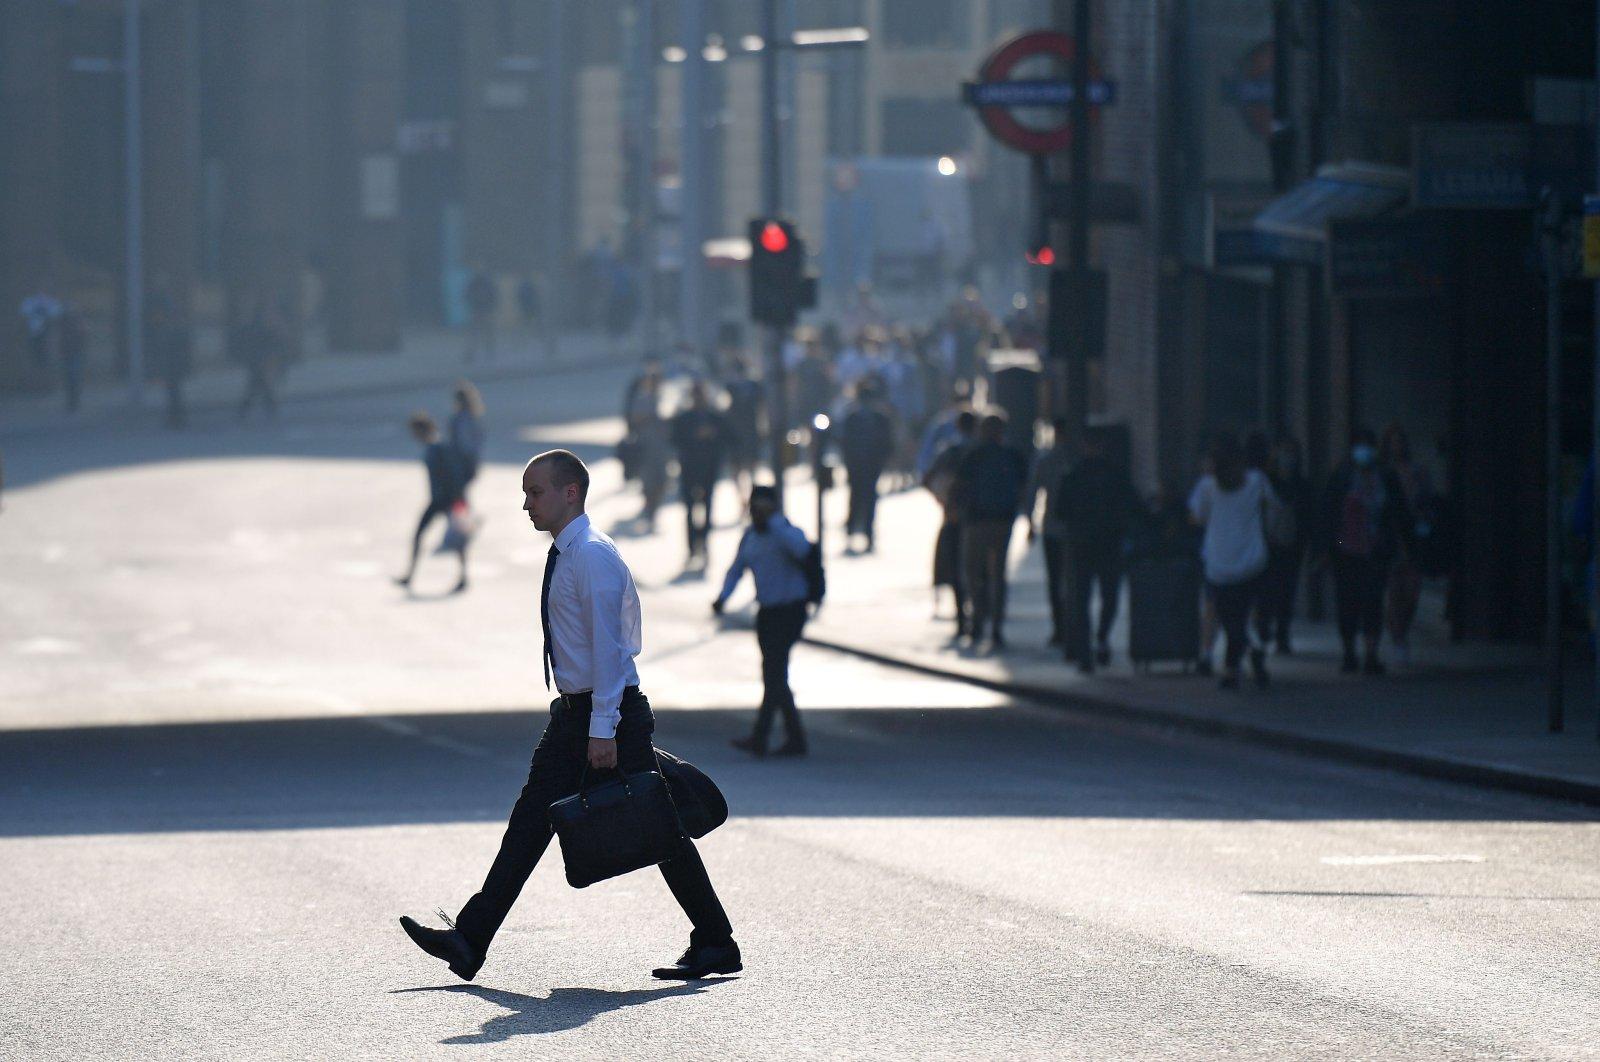 A commuter crosses a road by London Bridge in London, Britain, Sept. 15, 2020. (AFP Photo)